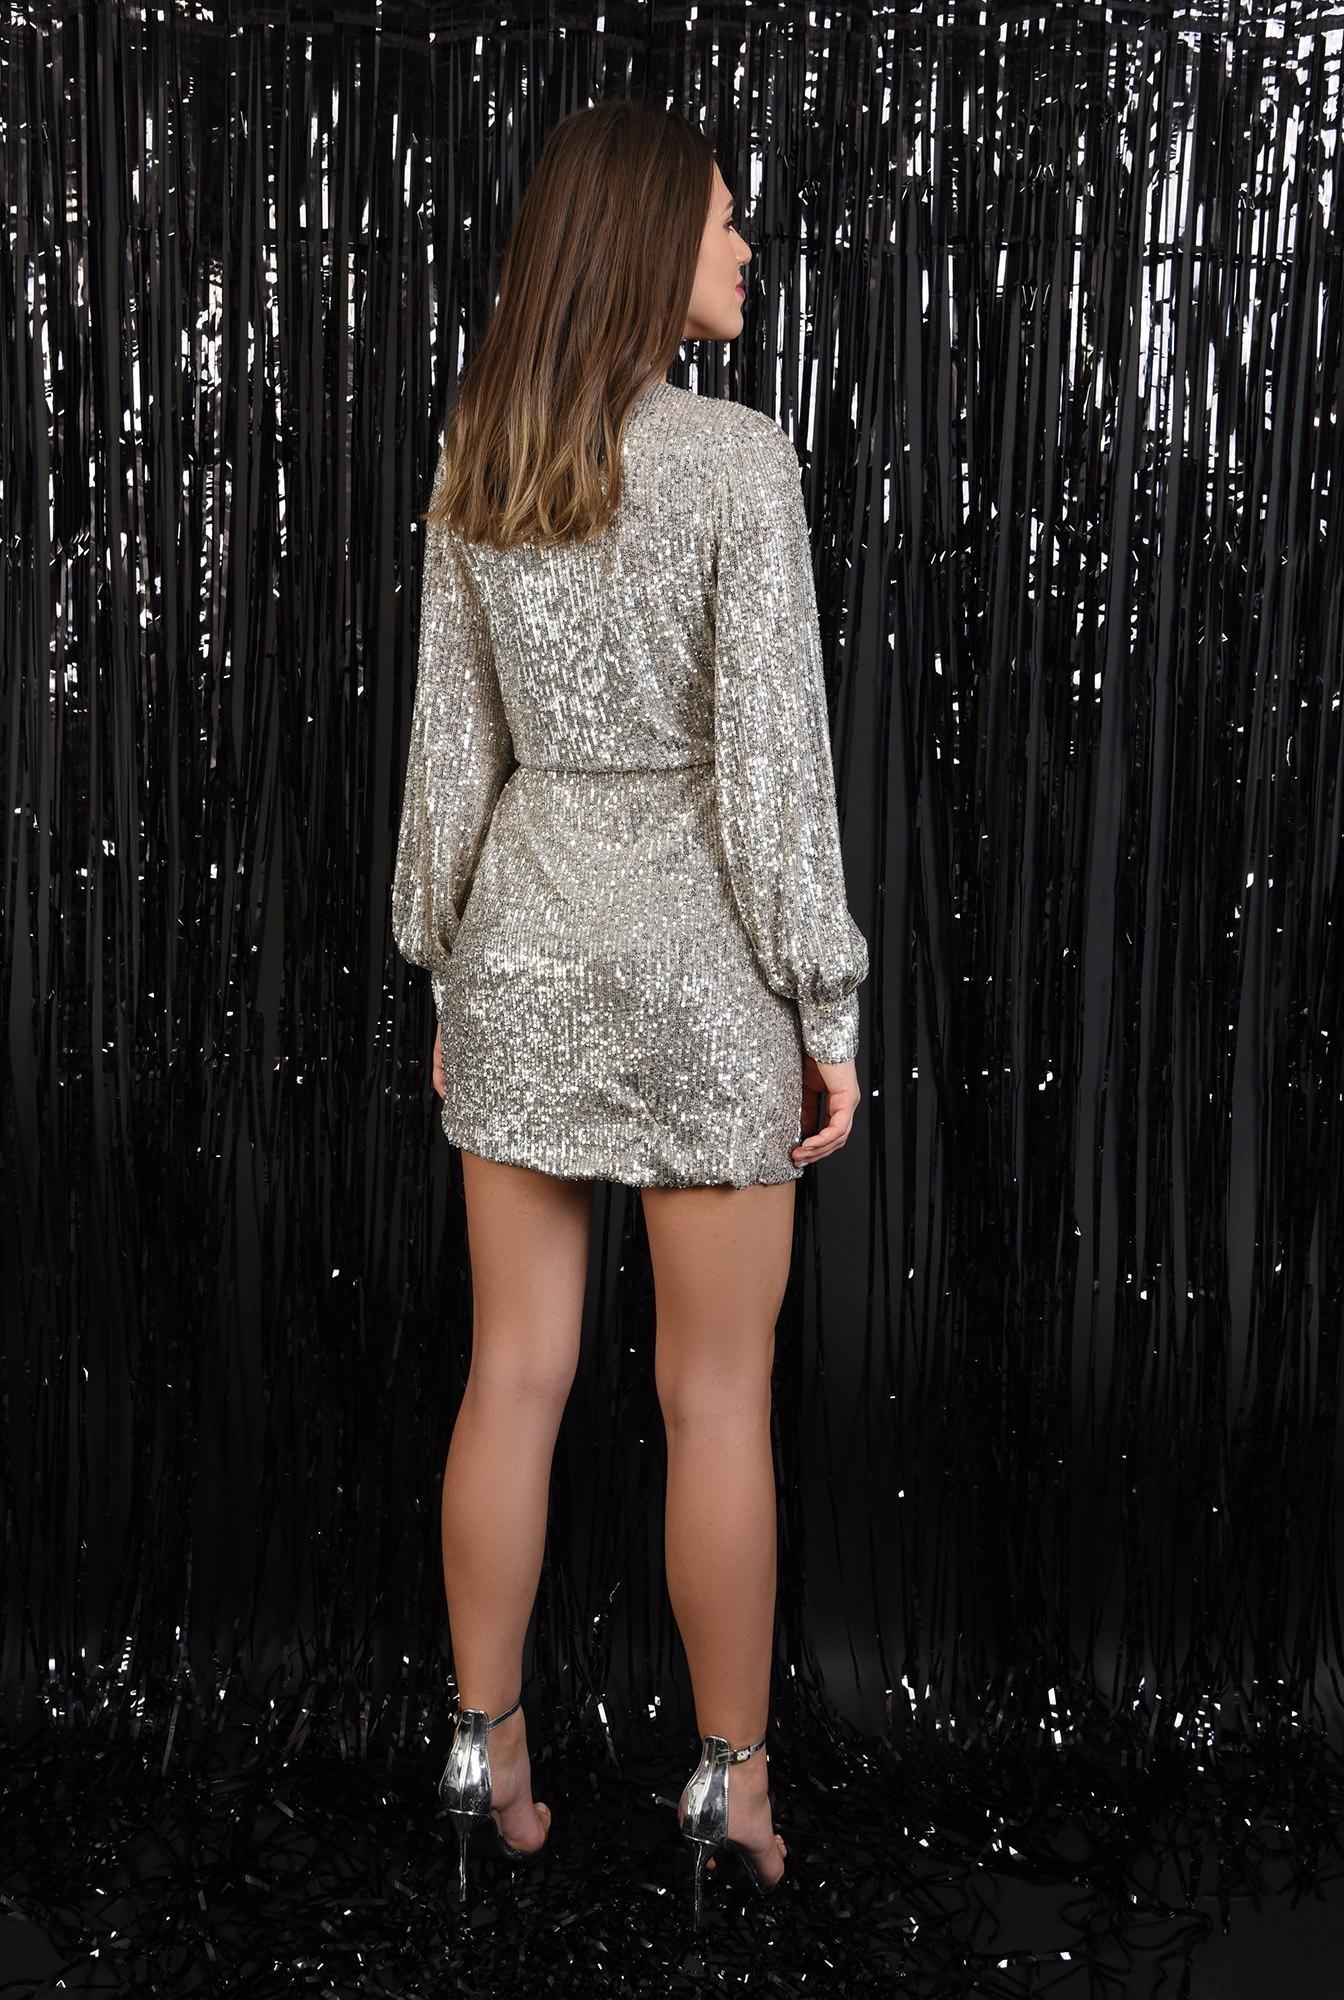 1 - 360 - rochie eleganta, cu paiete, aurie, snur din piele, scurta, Poema